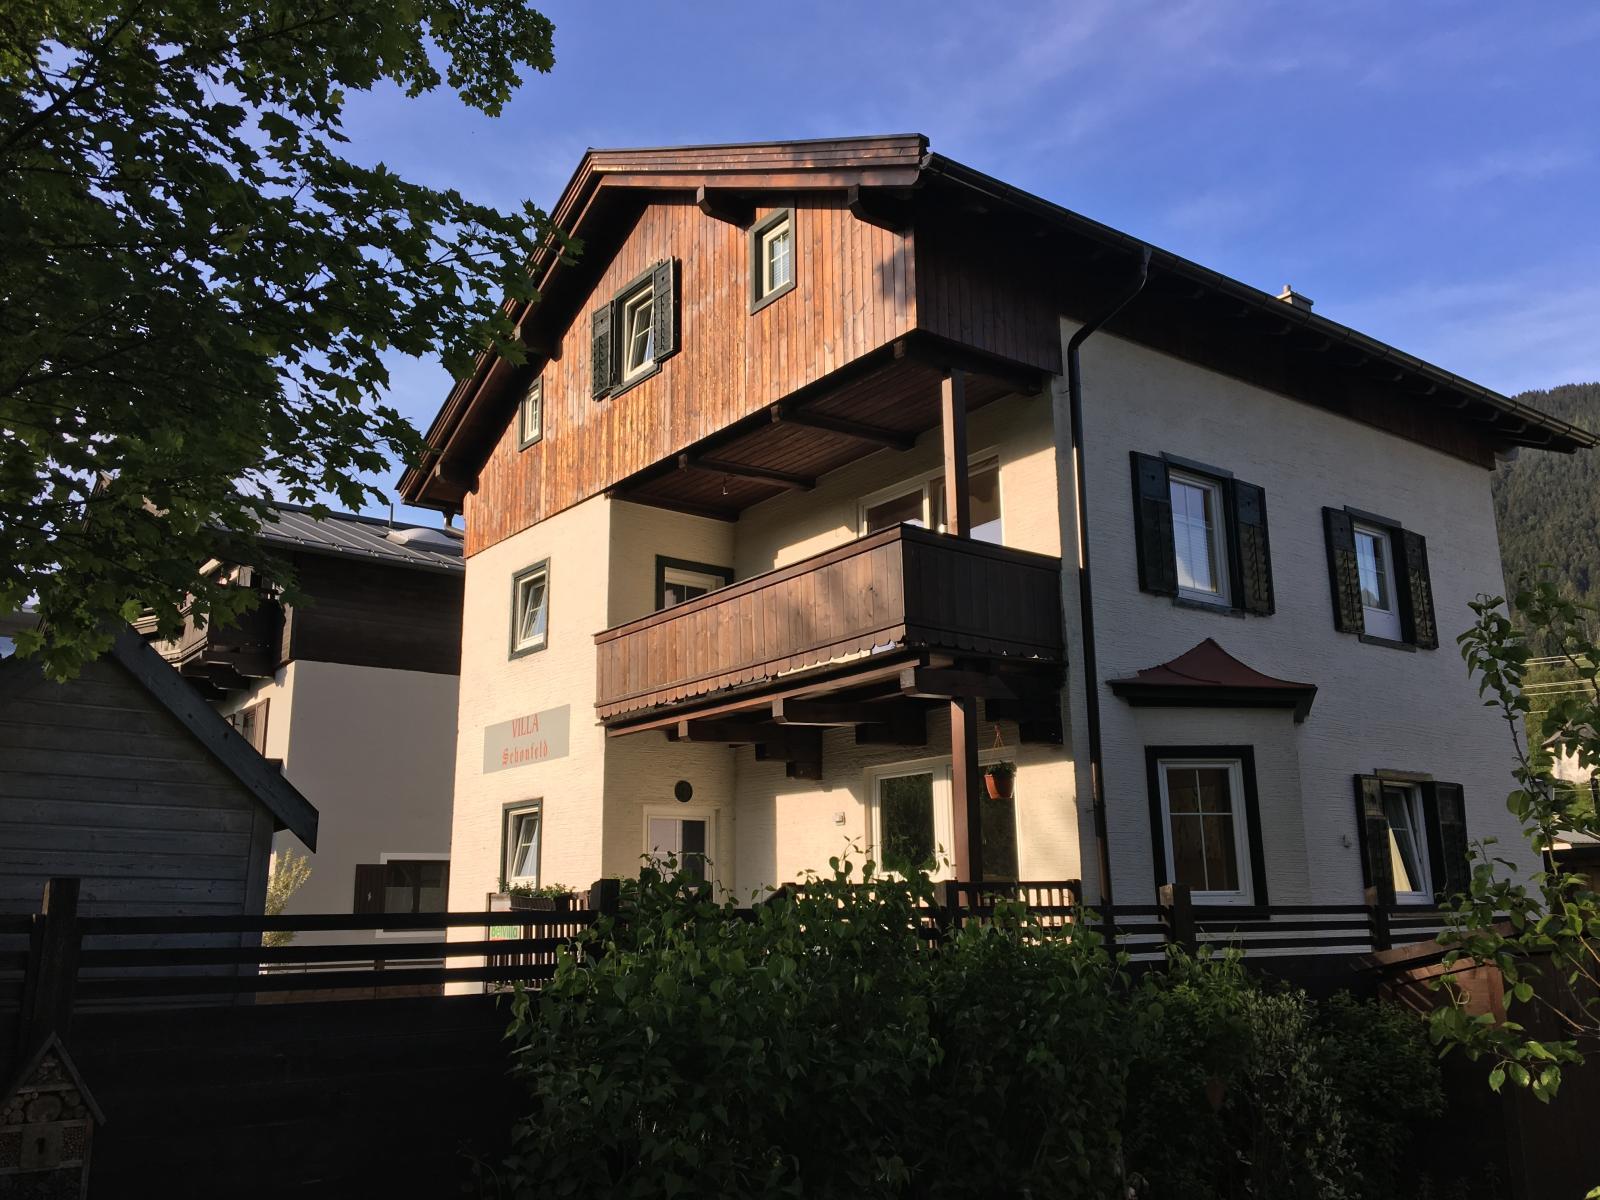 Chalet Schönblick I